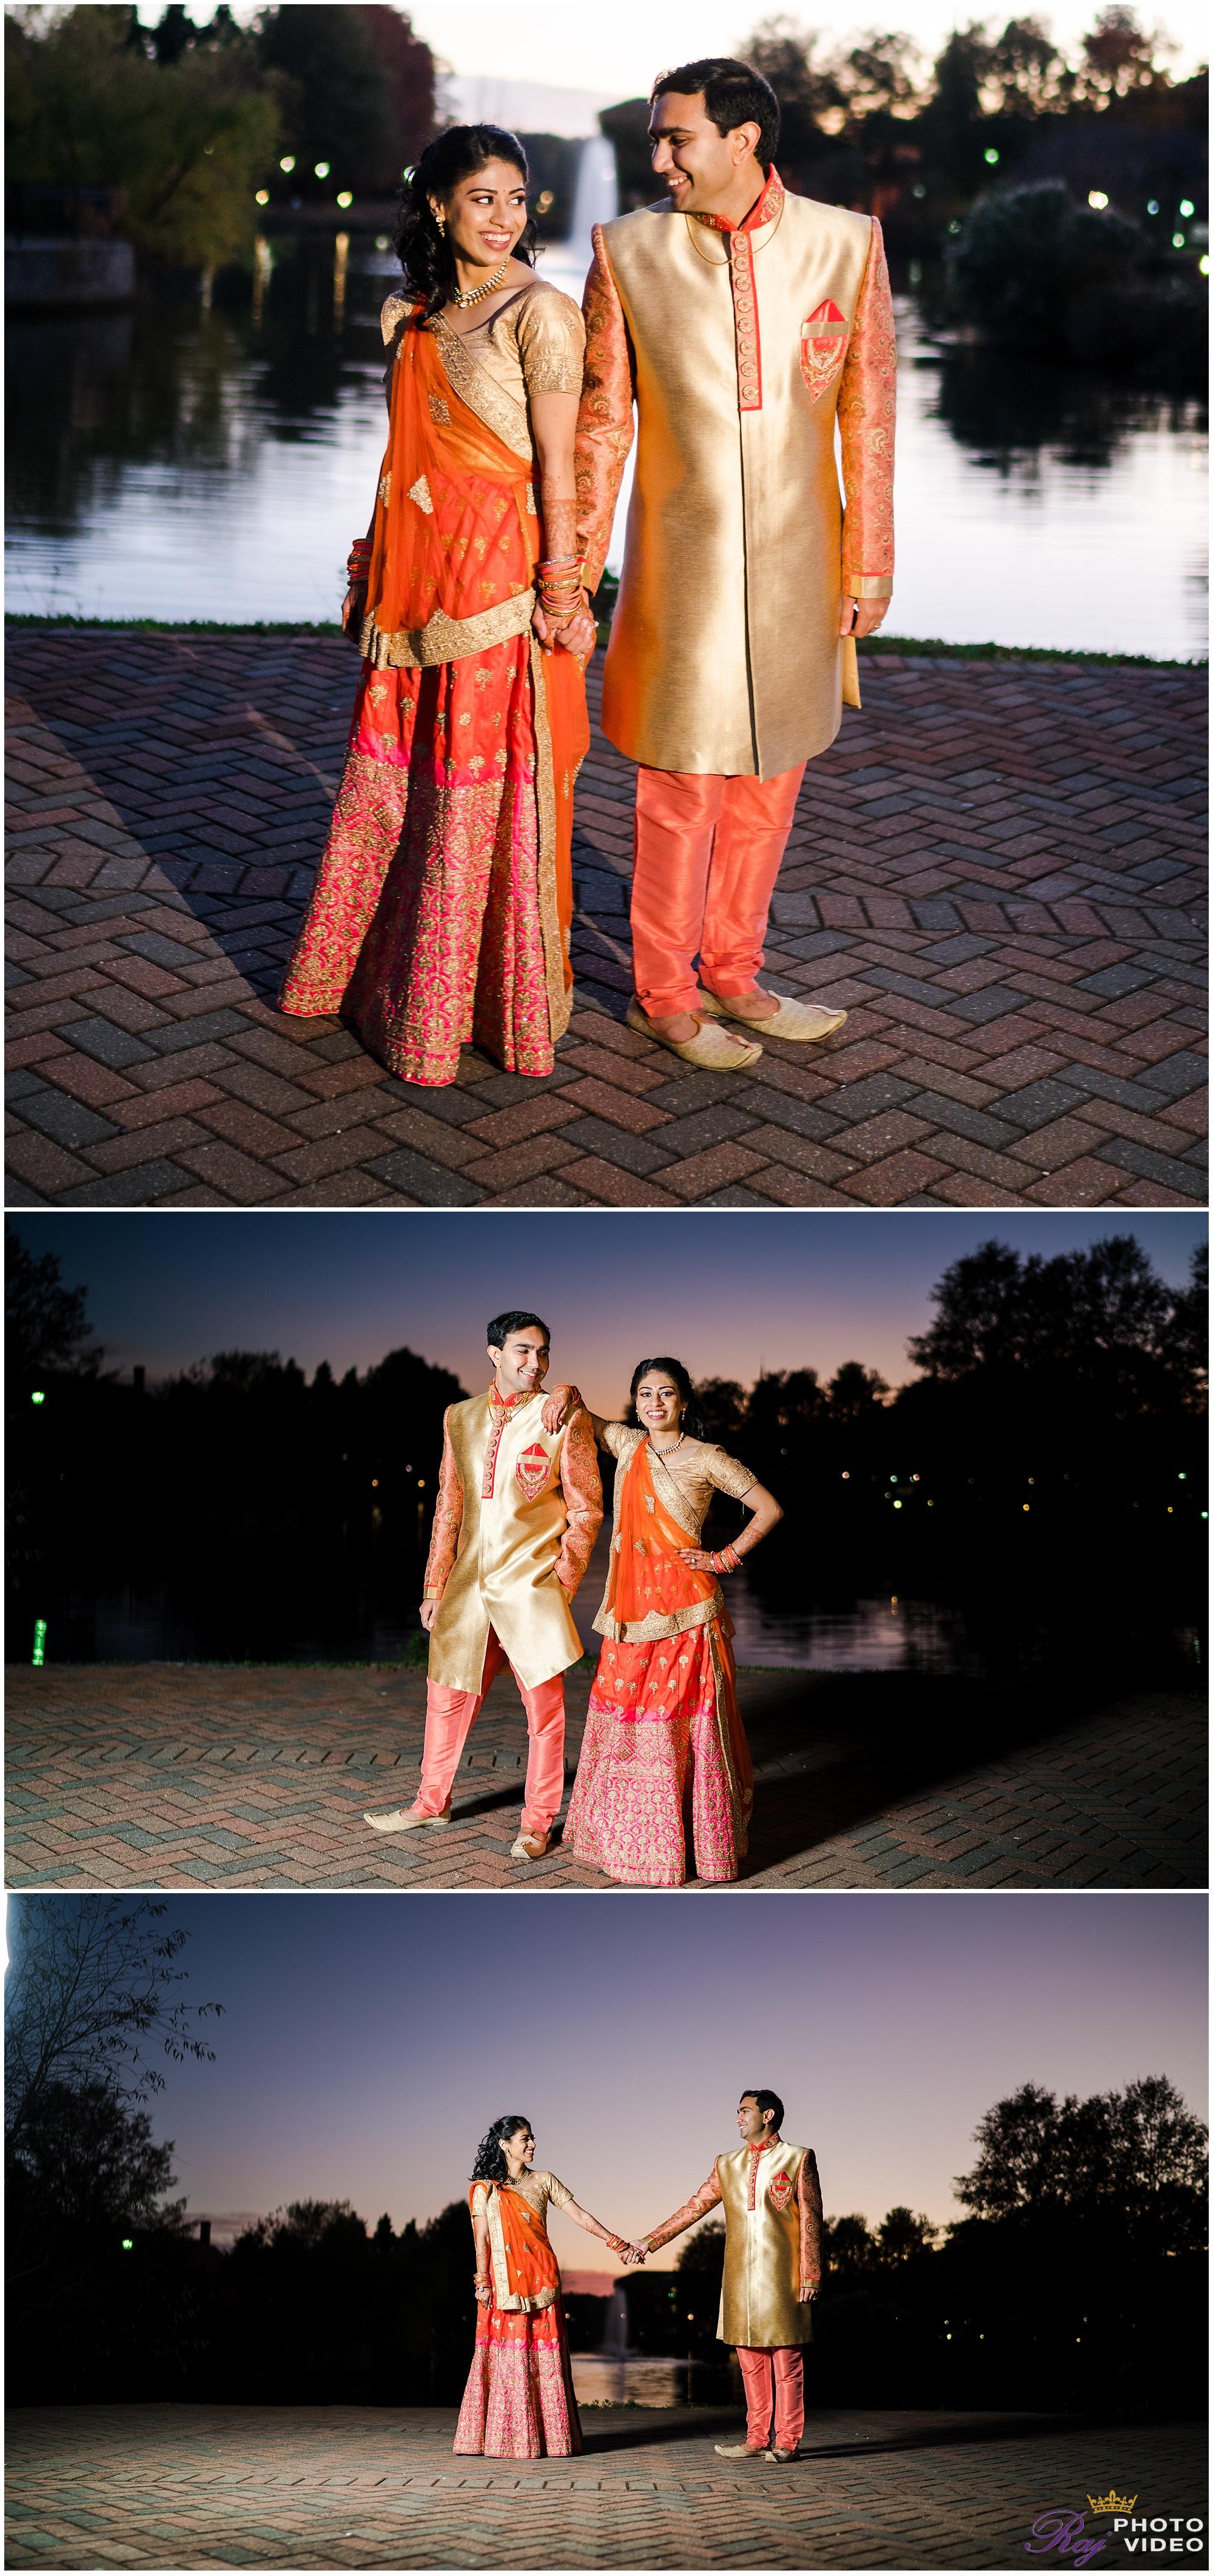 Founders-Inn-and-Spa-Virginia-Beach-VA-Indian-Wedding-Harini-Vivek-7.jpg